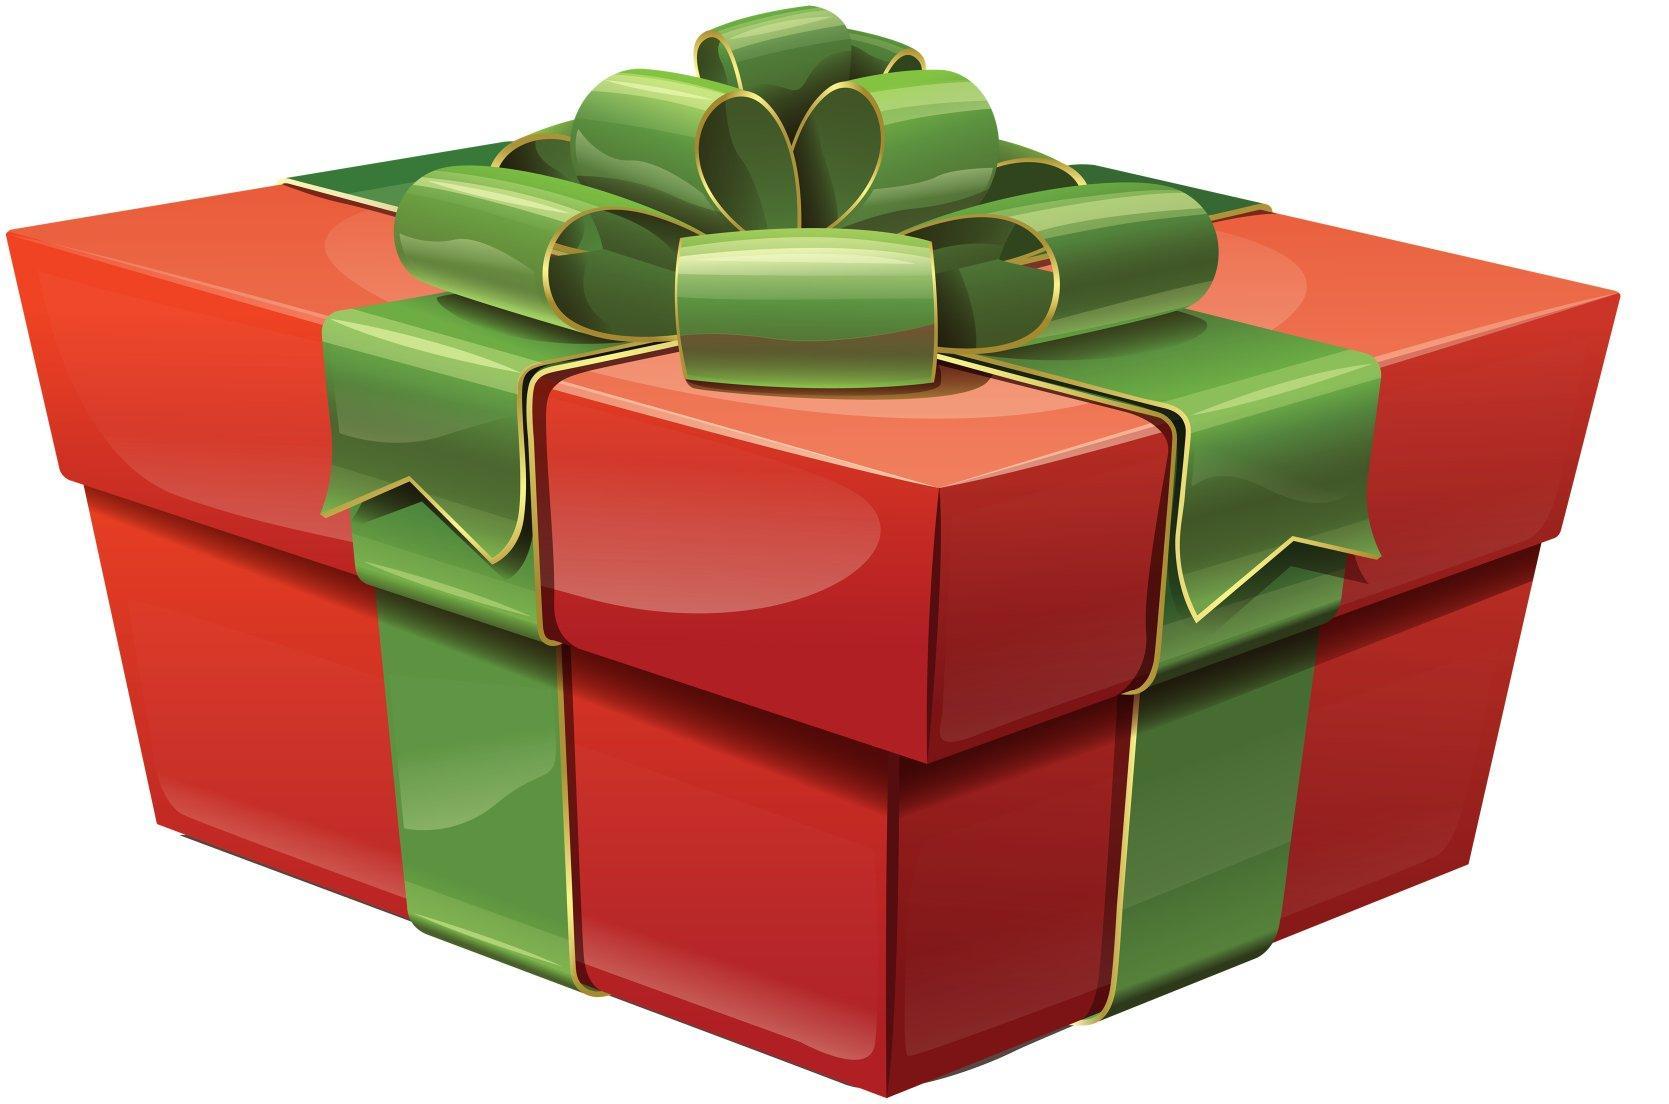 Png картинка подарок 47